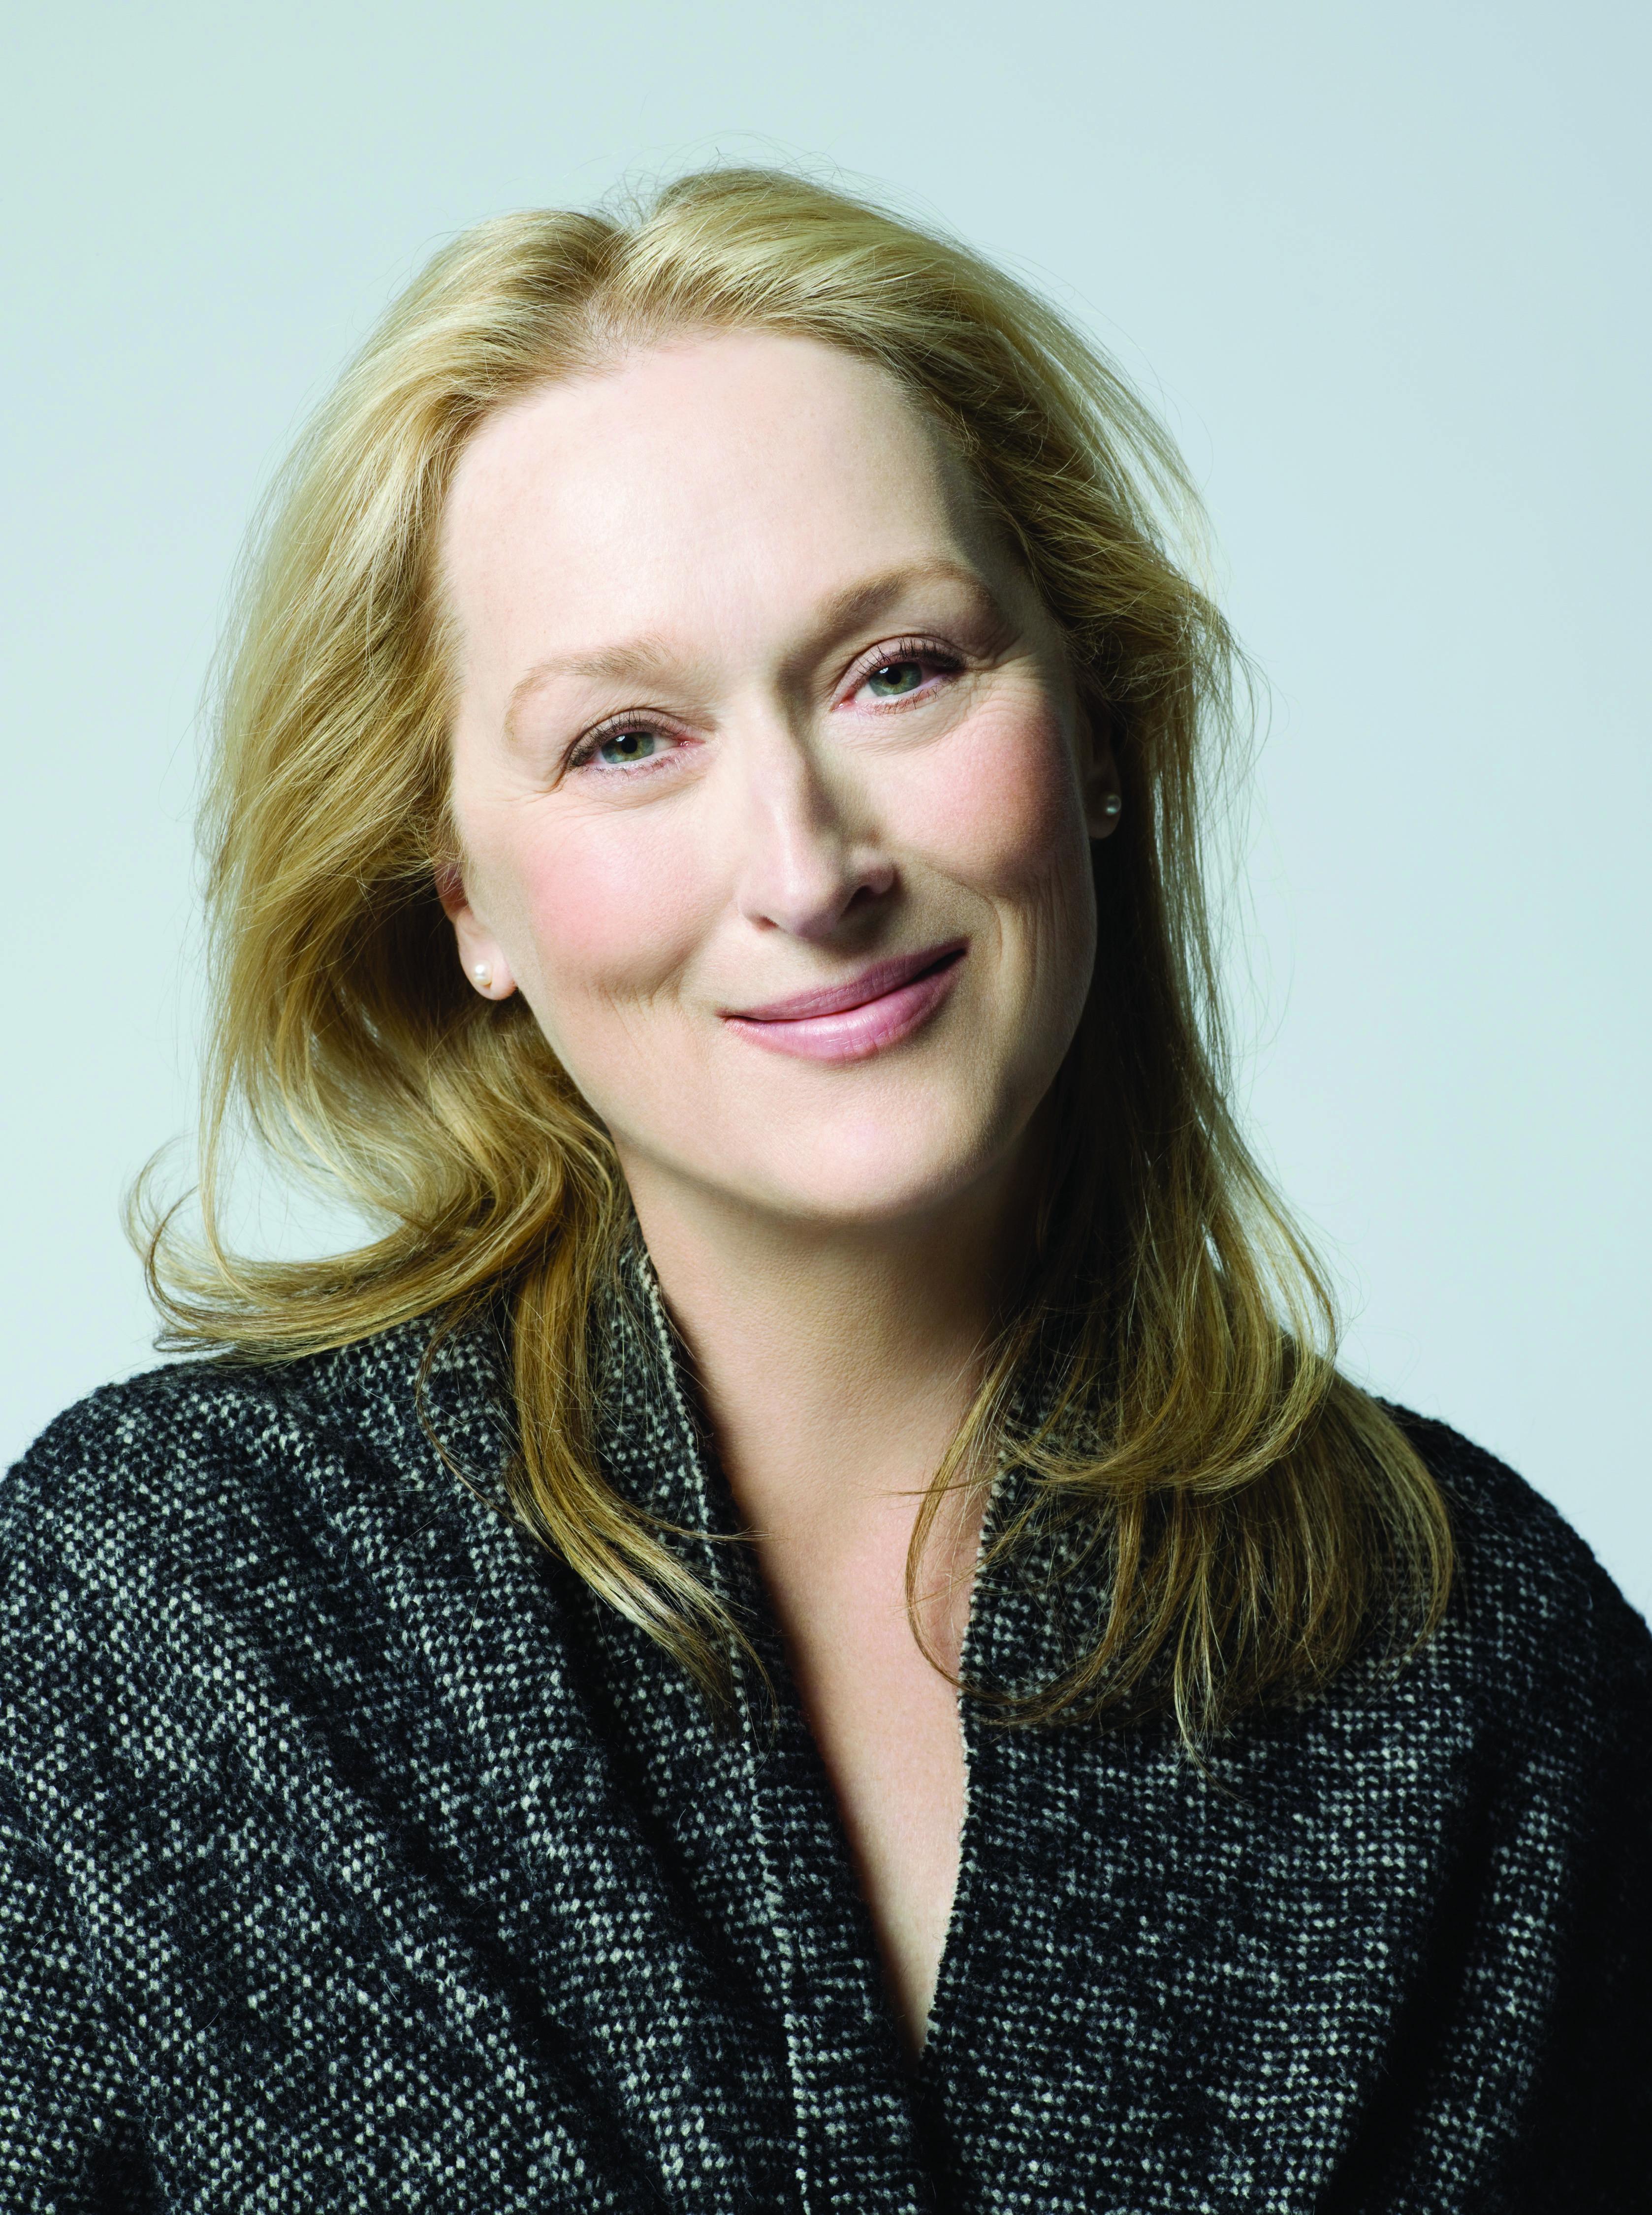 Meryl Streep Headshot -Credit  Brigitte Lacombe